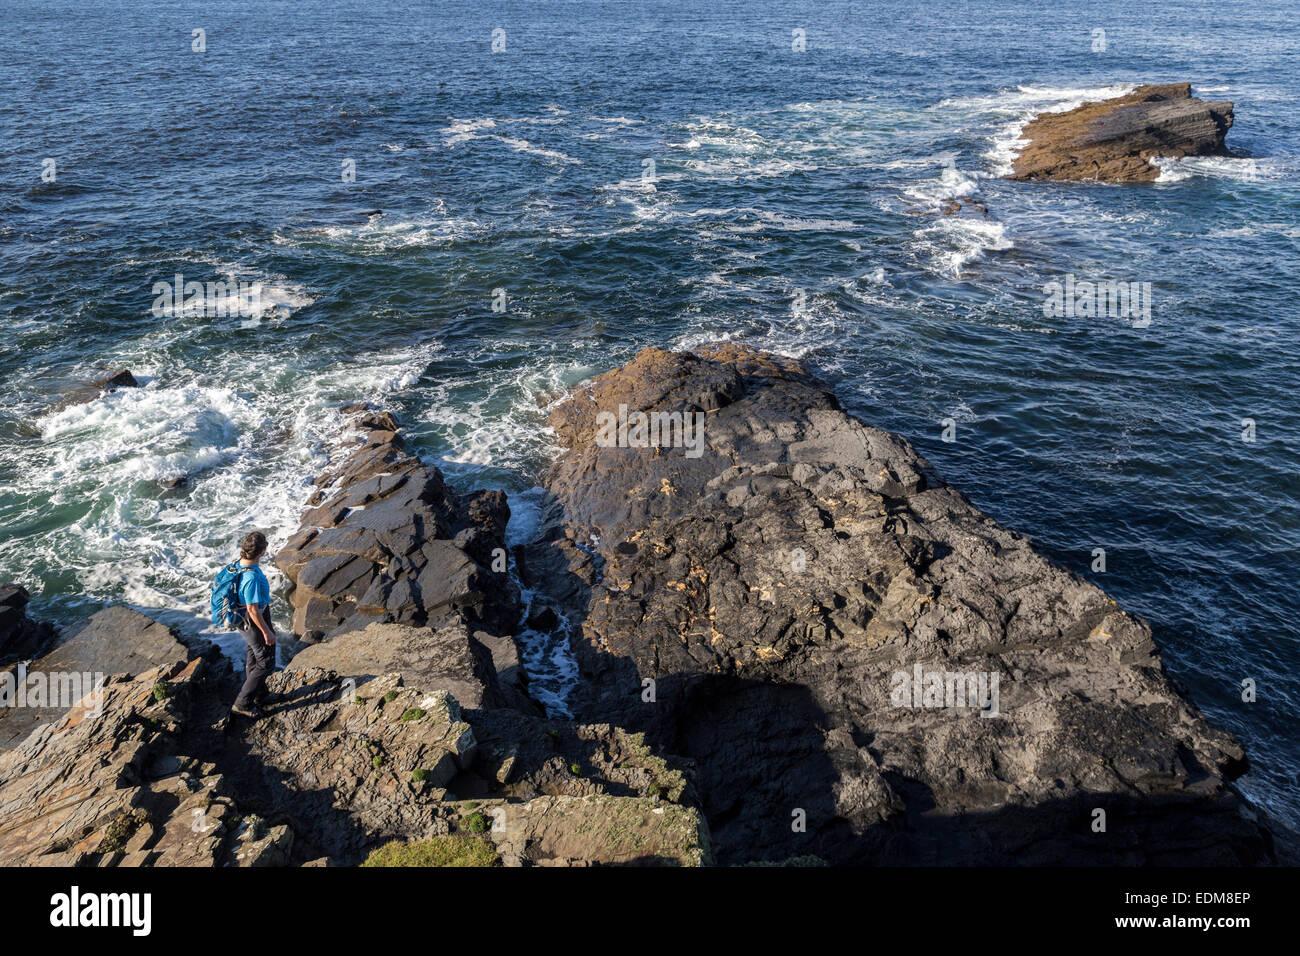 Headland at Mal Bay, Co. Clare on the west coast of Ireland - Stock Image